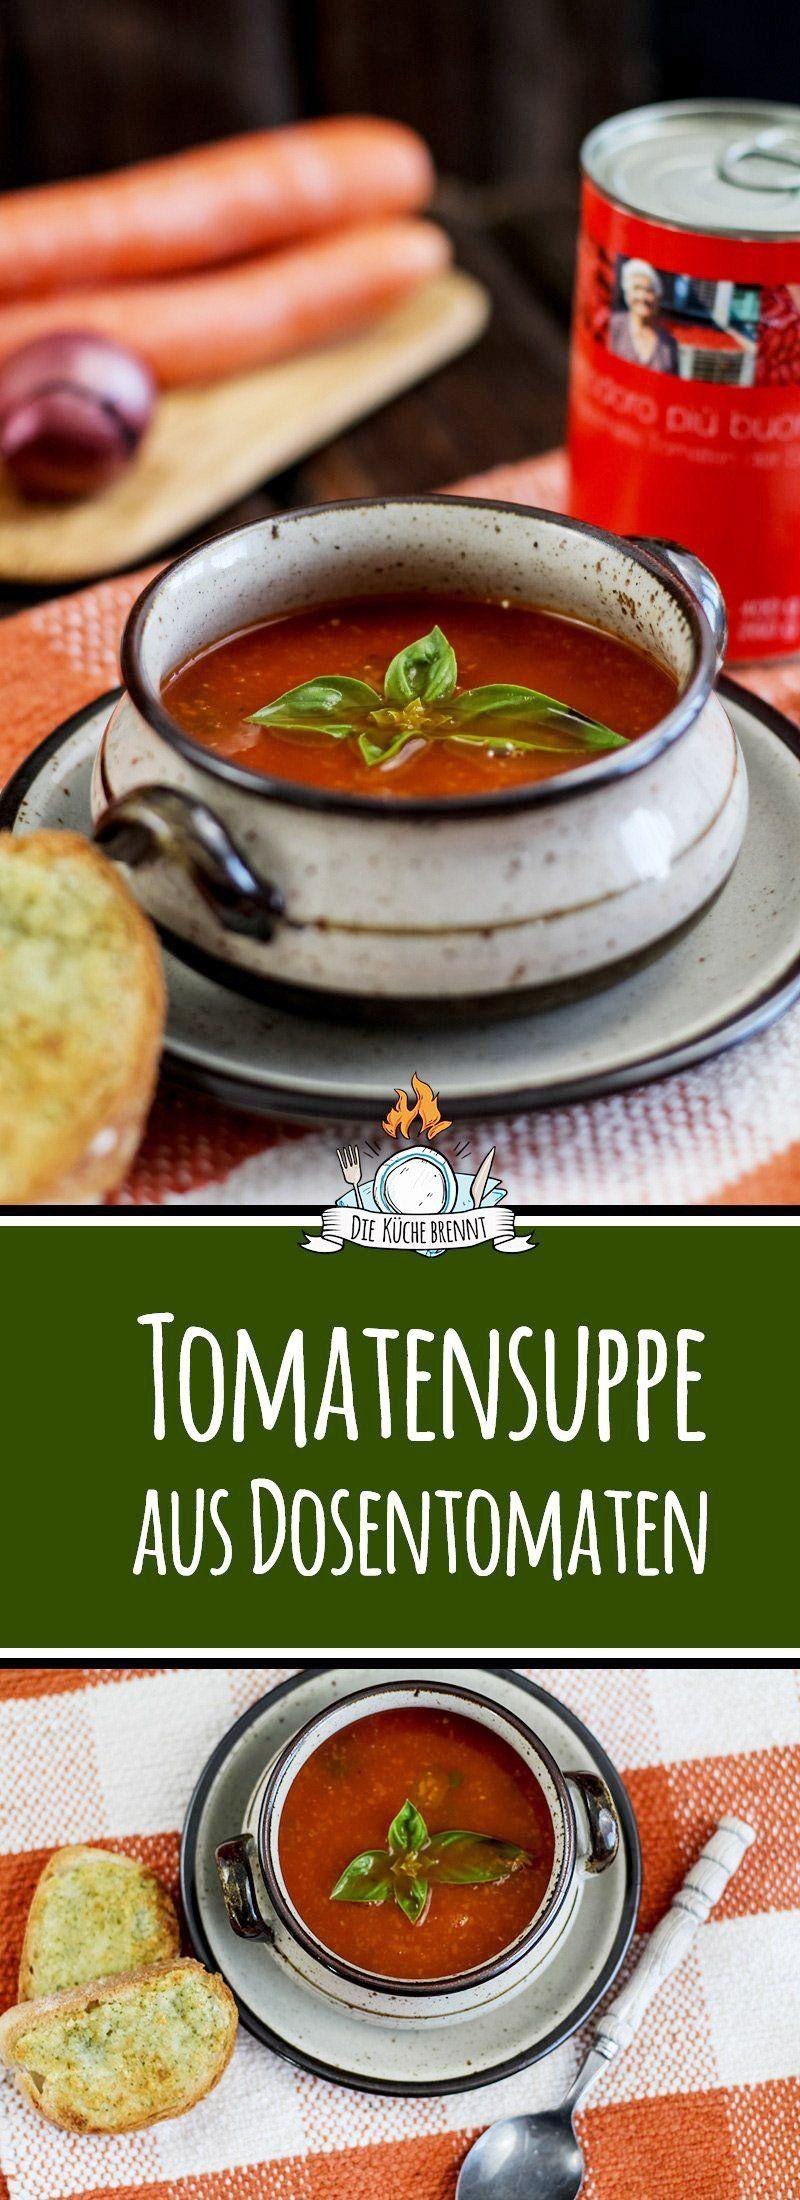 Einfache Tomatensuppe aus Dosentomaten selber machen #atkinsmeals